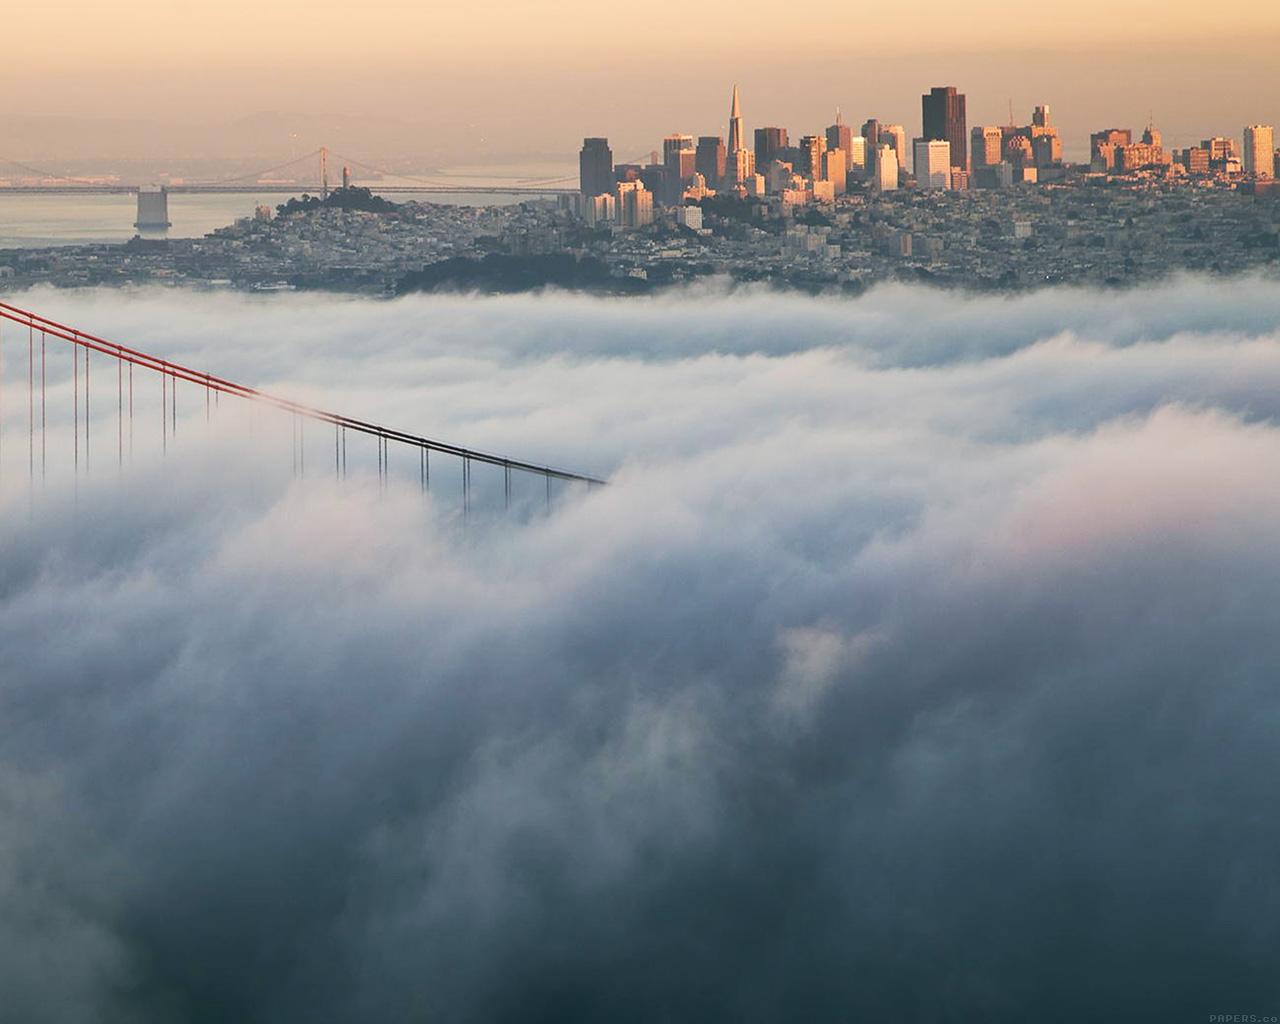 ml90-bridge-fog-city-river-peace-lake-nature-wallpaper